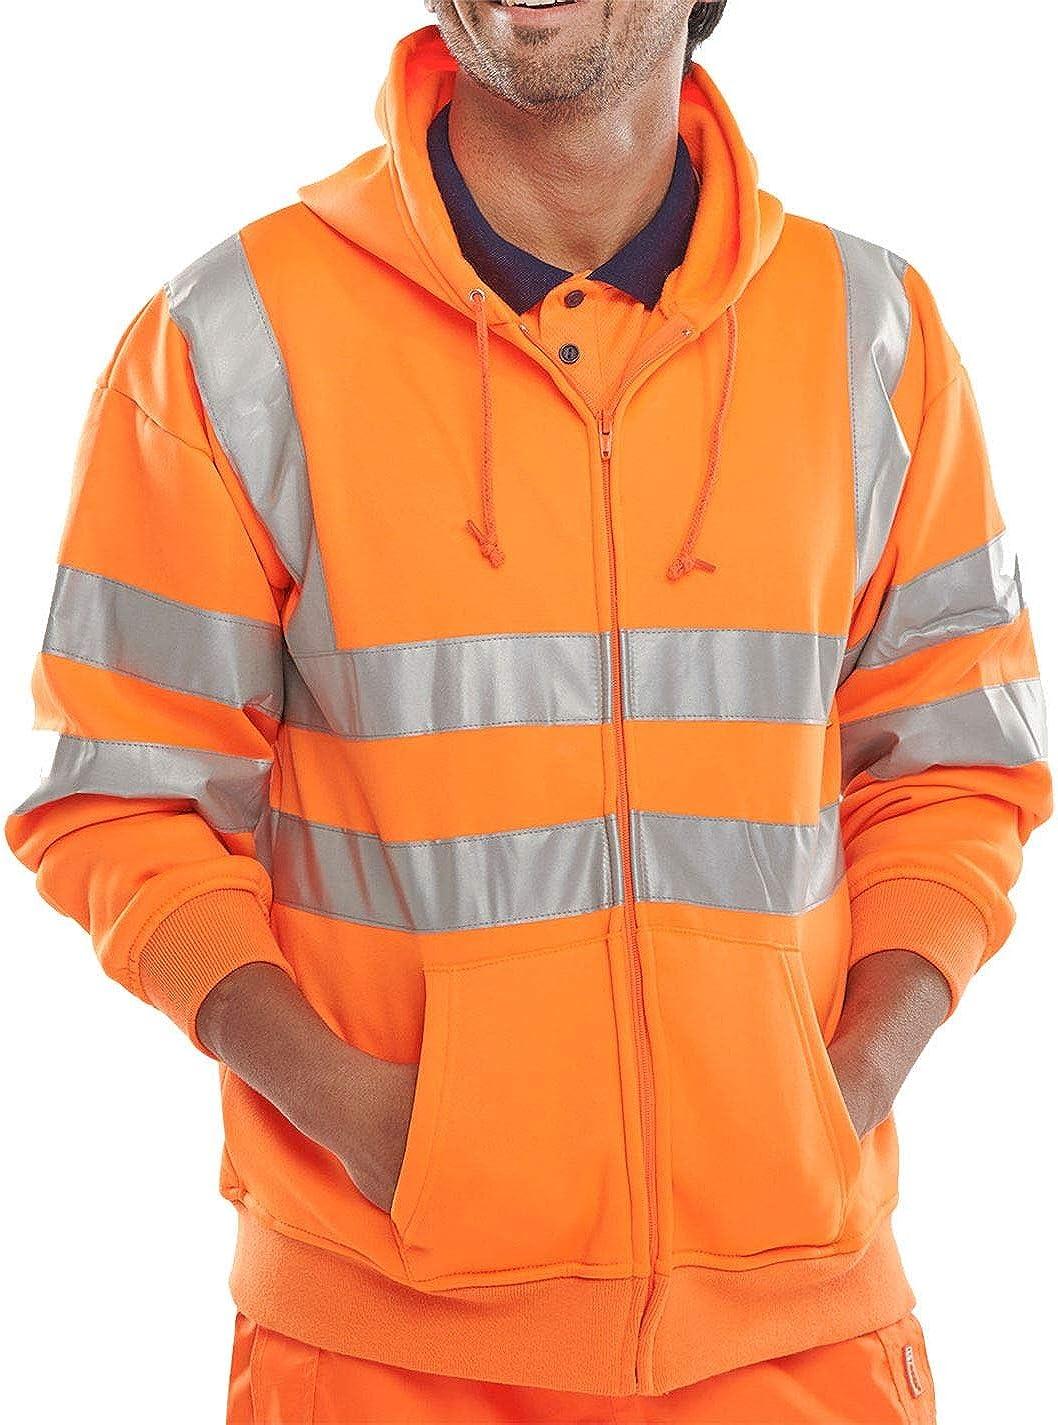 Rimi Hanger Hi Viz Vis High Visibility Hooded Sweatshirt Reflective Work Zip Fleece Jacket Small/3X Large